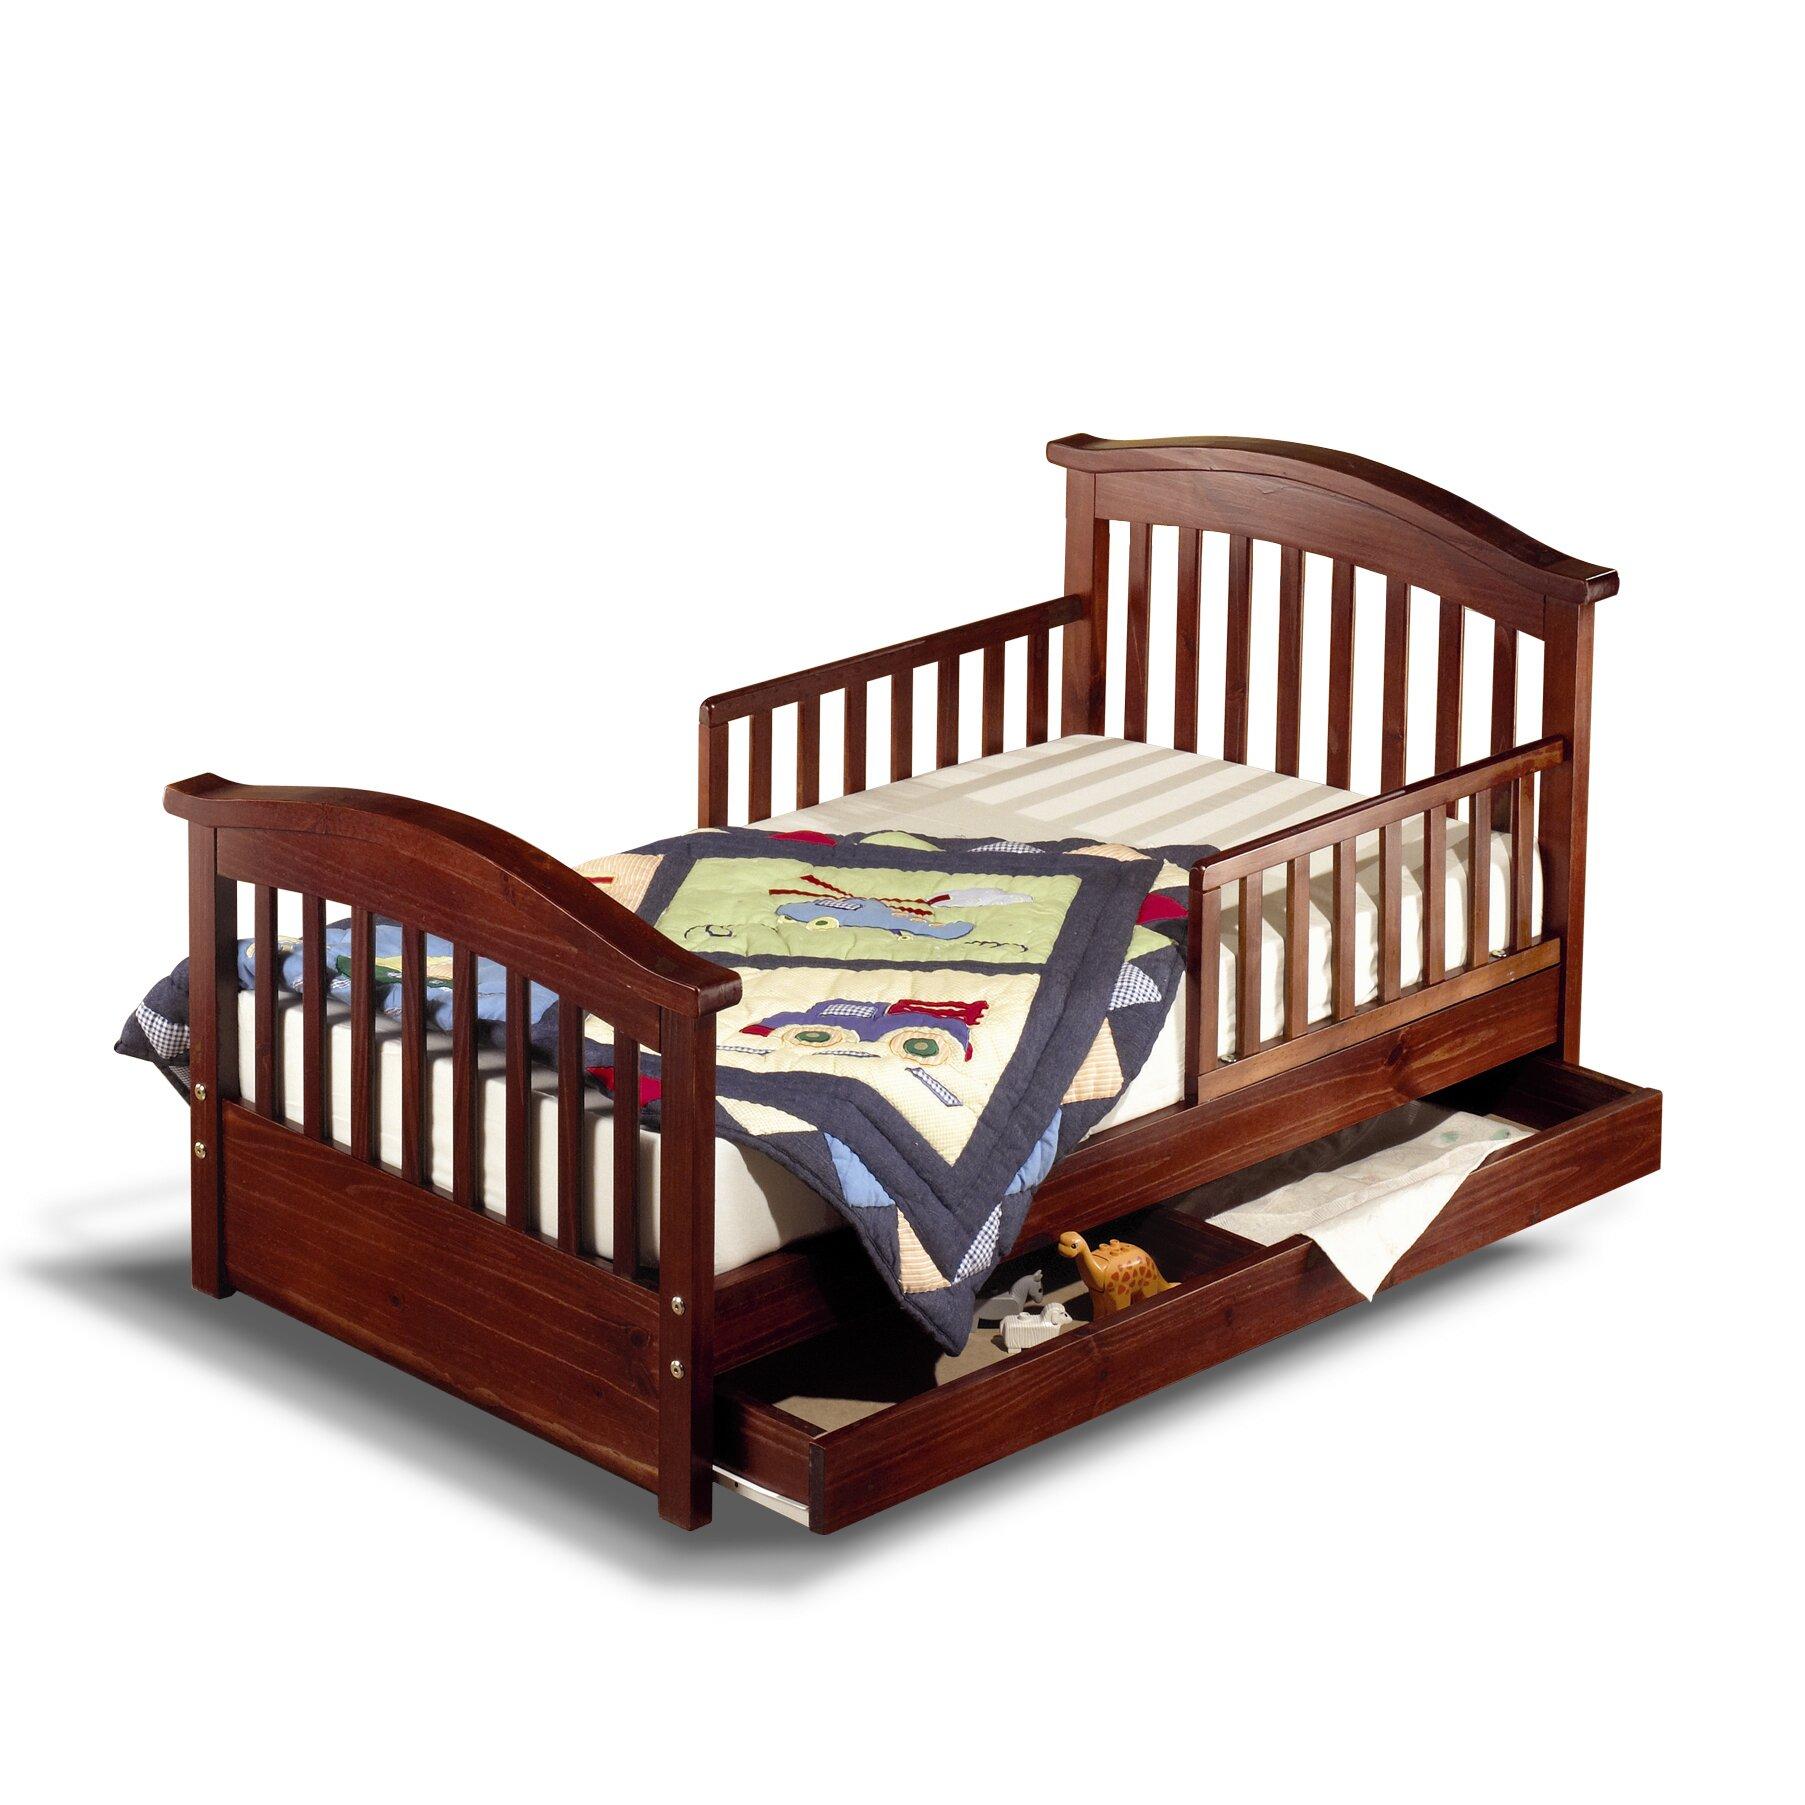 sorelle joel pine toddler bed with storage reviews wayfair. Black Bedroom Furniture Sets. Home Design Ideas